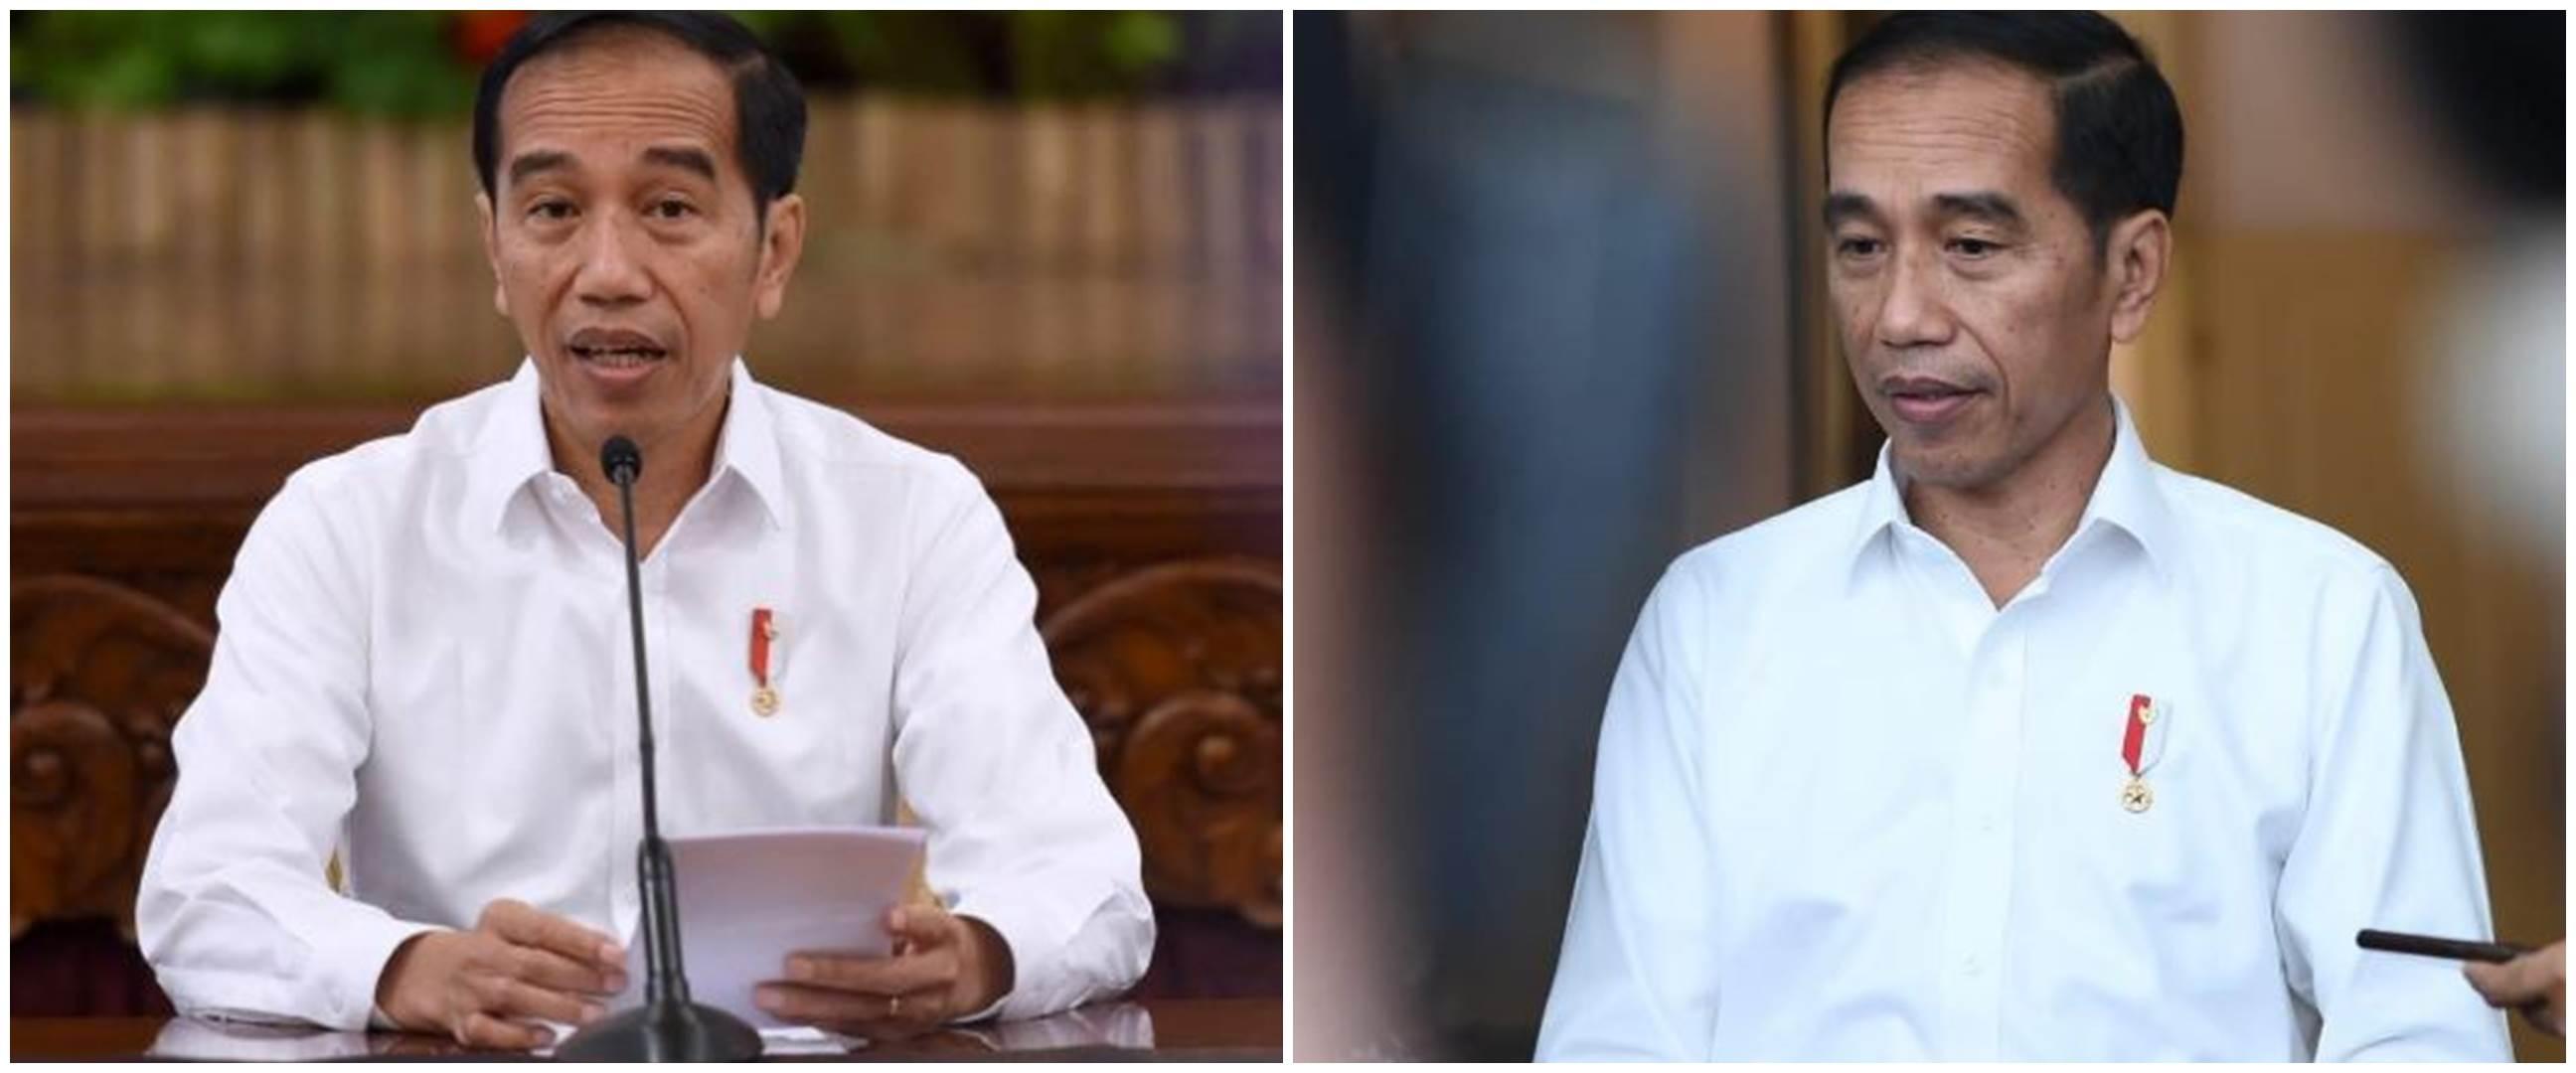 Kontroversi wacana Presiden Joko Widodo soal hukum mati koruptor